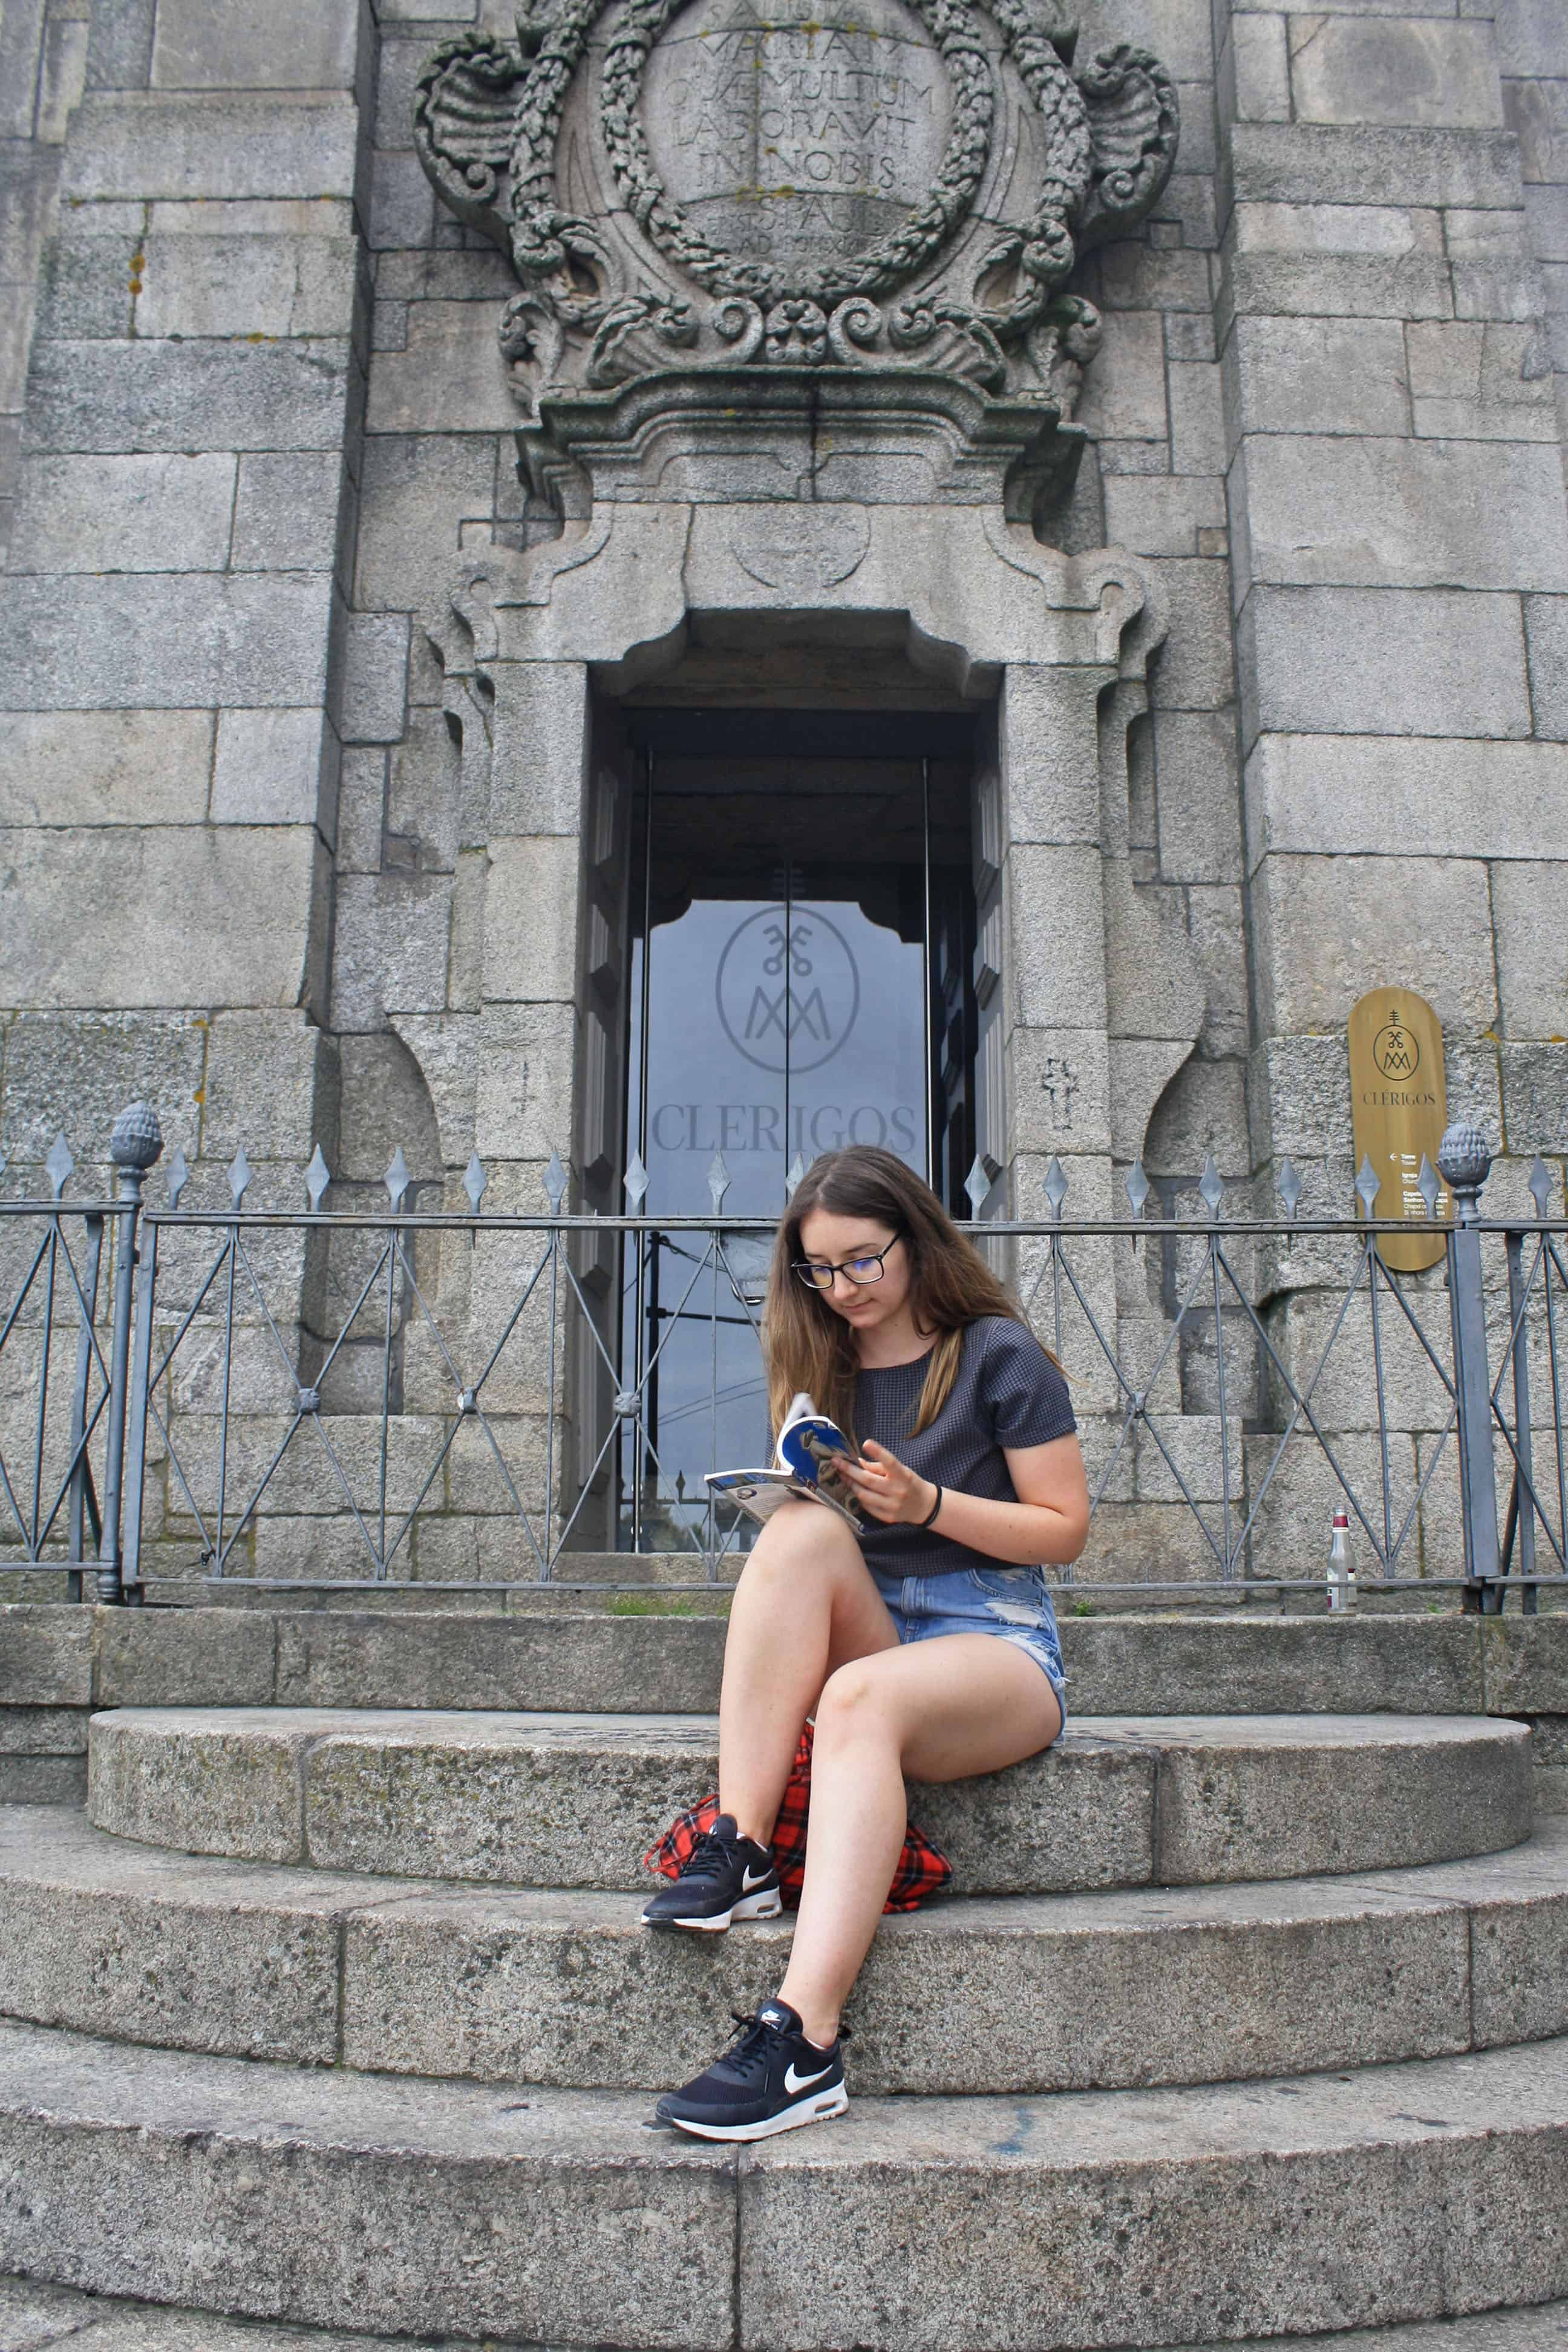 On the steps of Clérigos Tower, Porto